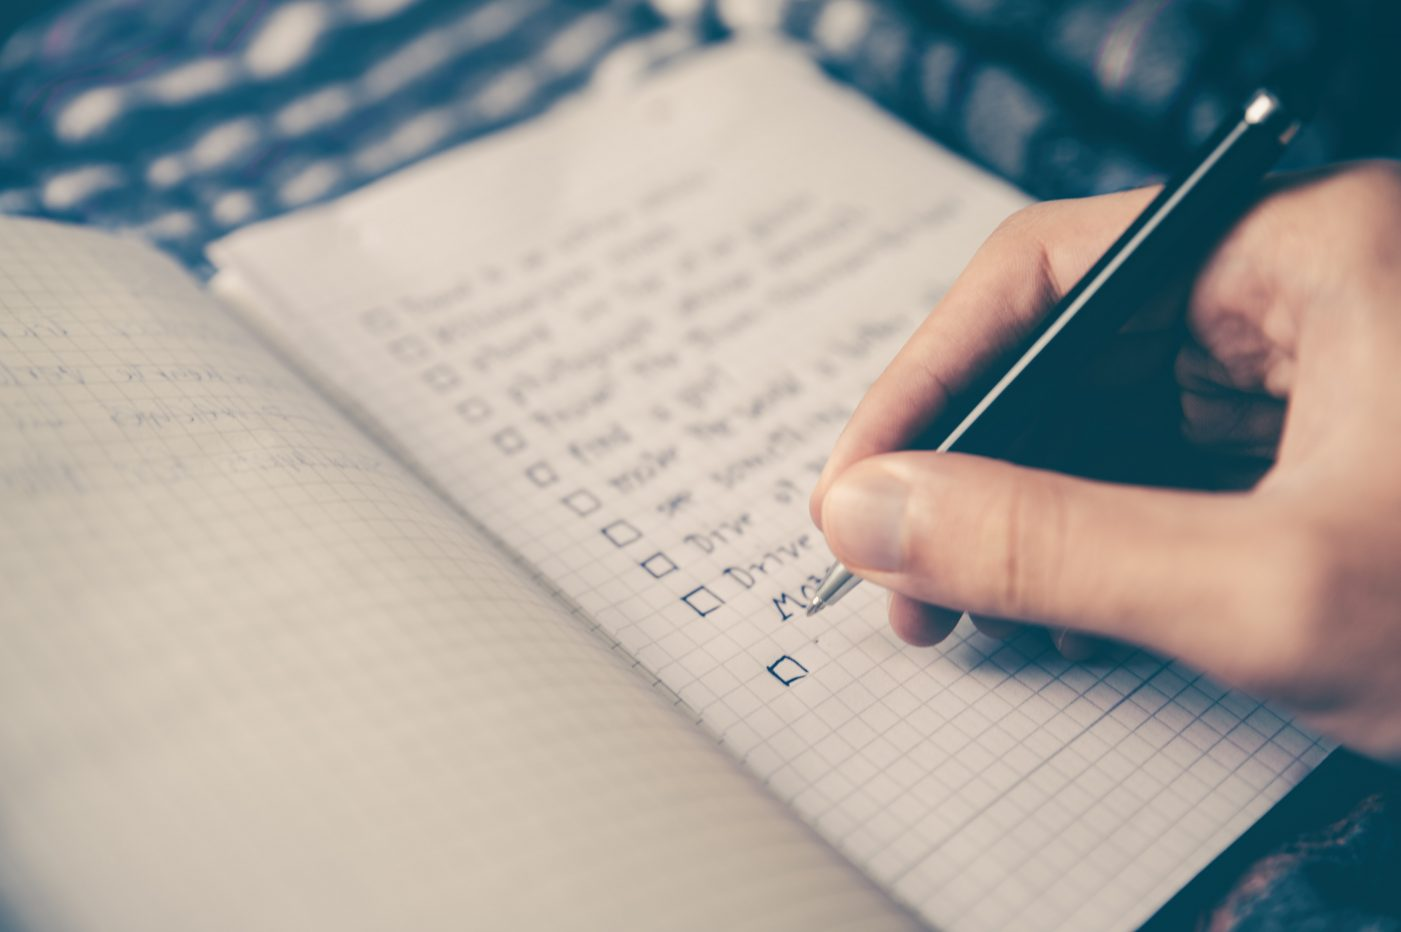 Eisen-lijst schrijven